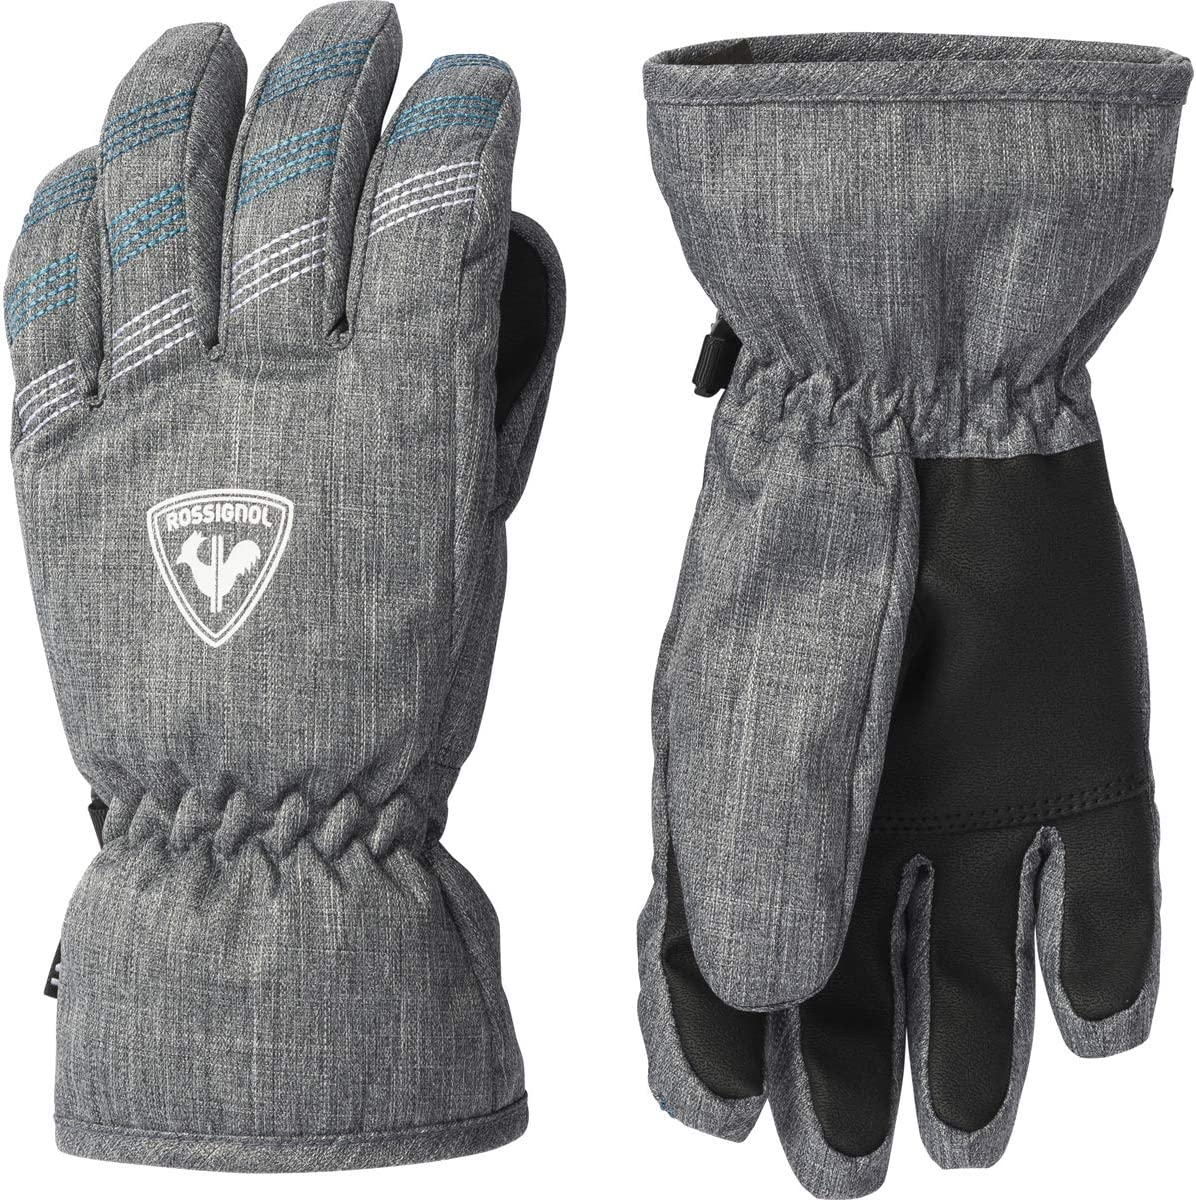 Rossignol Popy Impr Ski Gloves Unisex Children